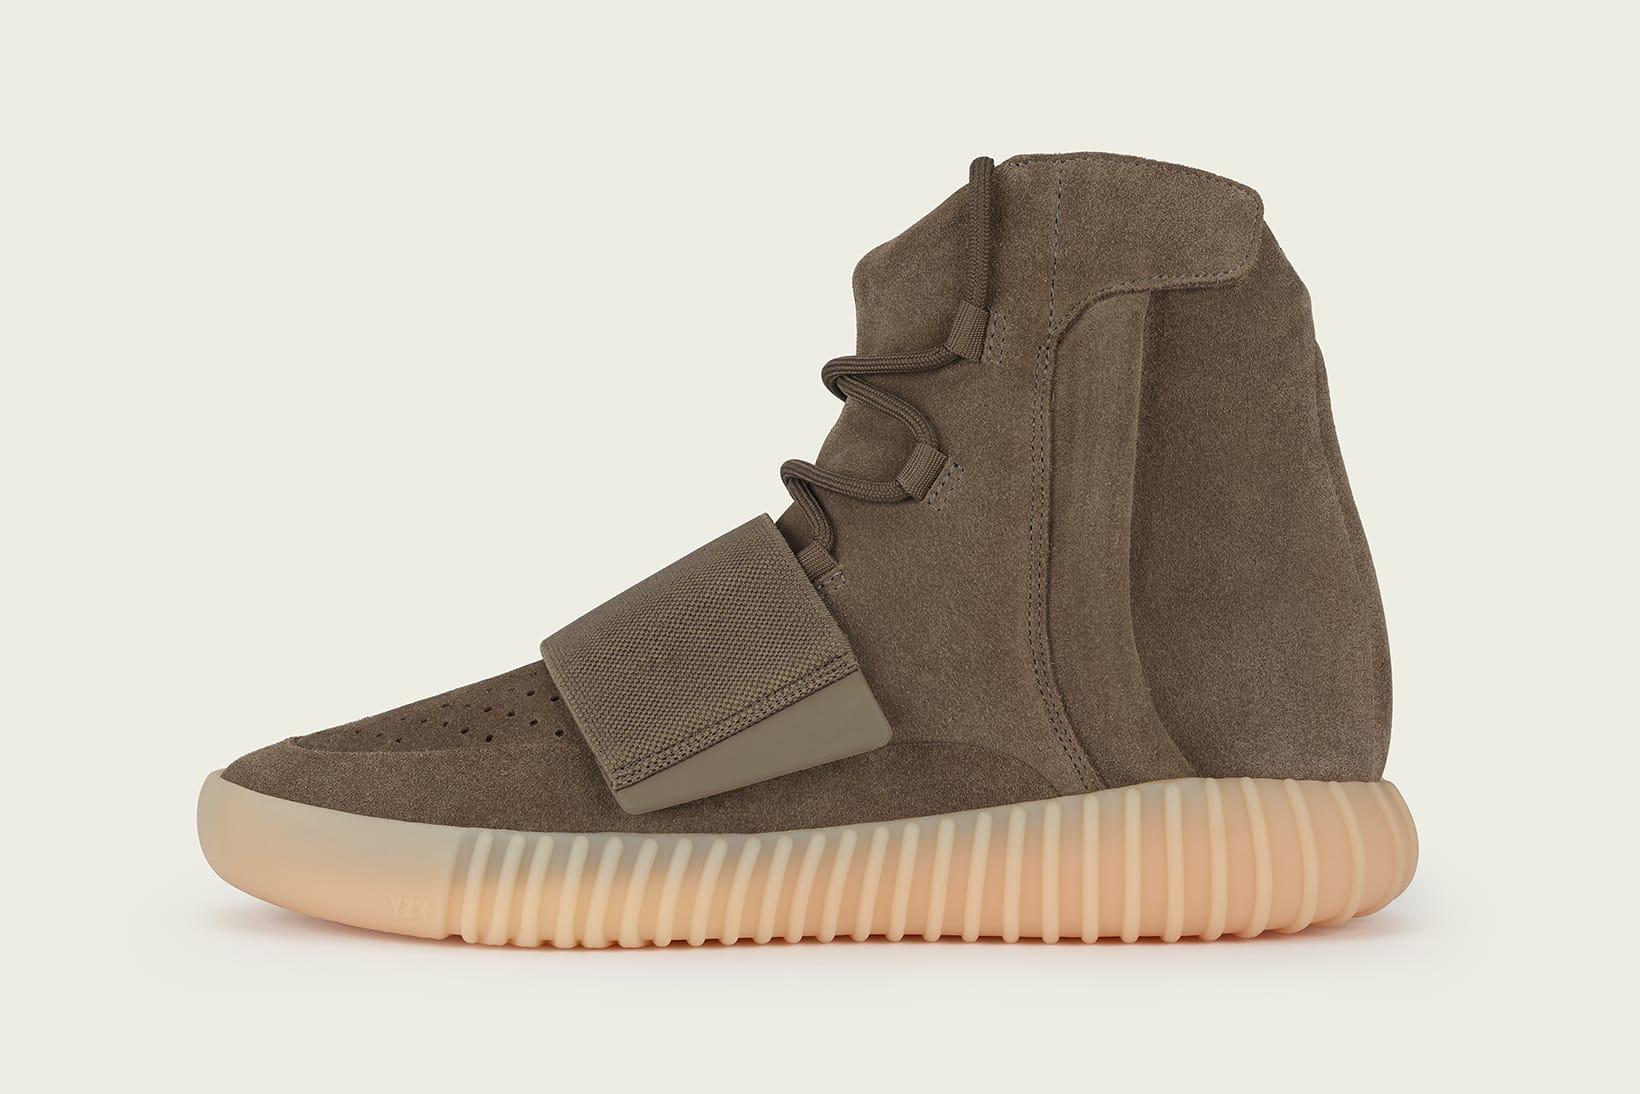 adidas Yeezy BOOST 750 Brown Store List